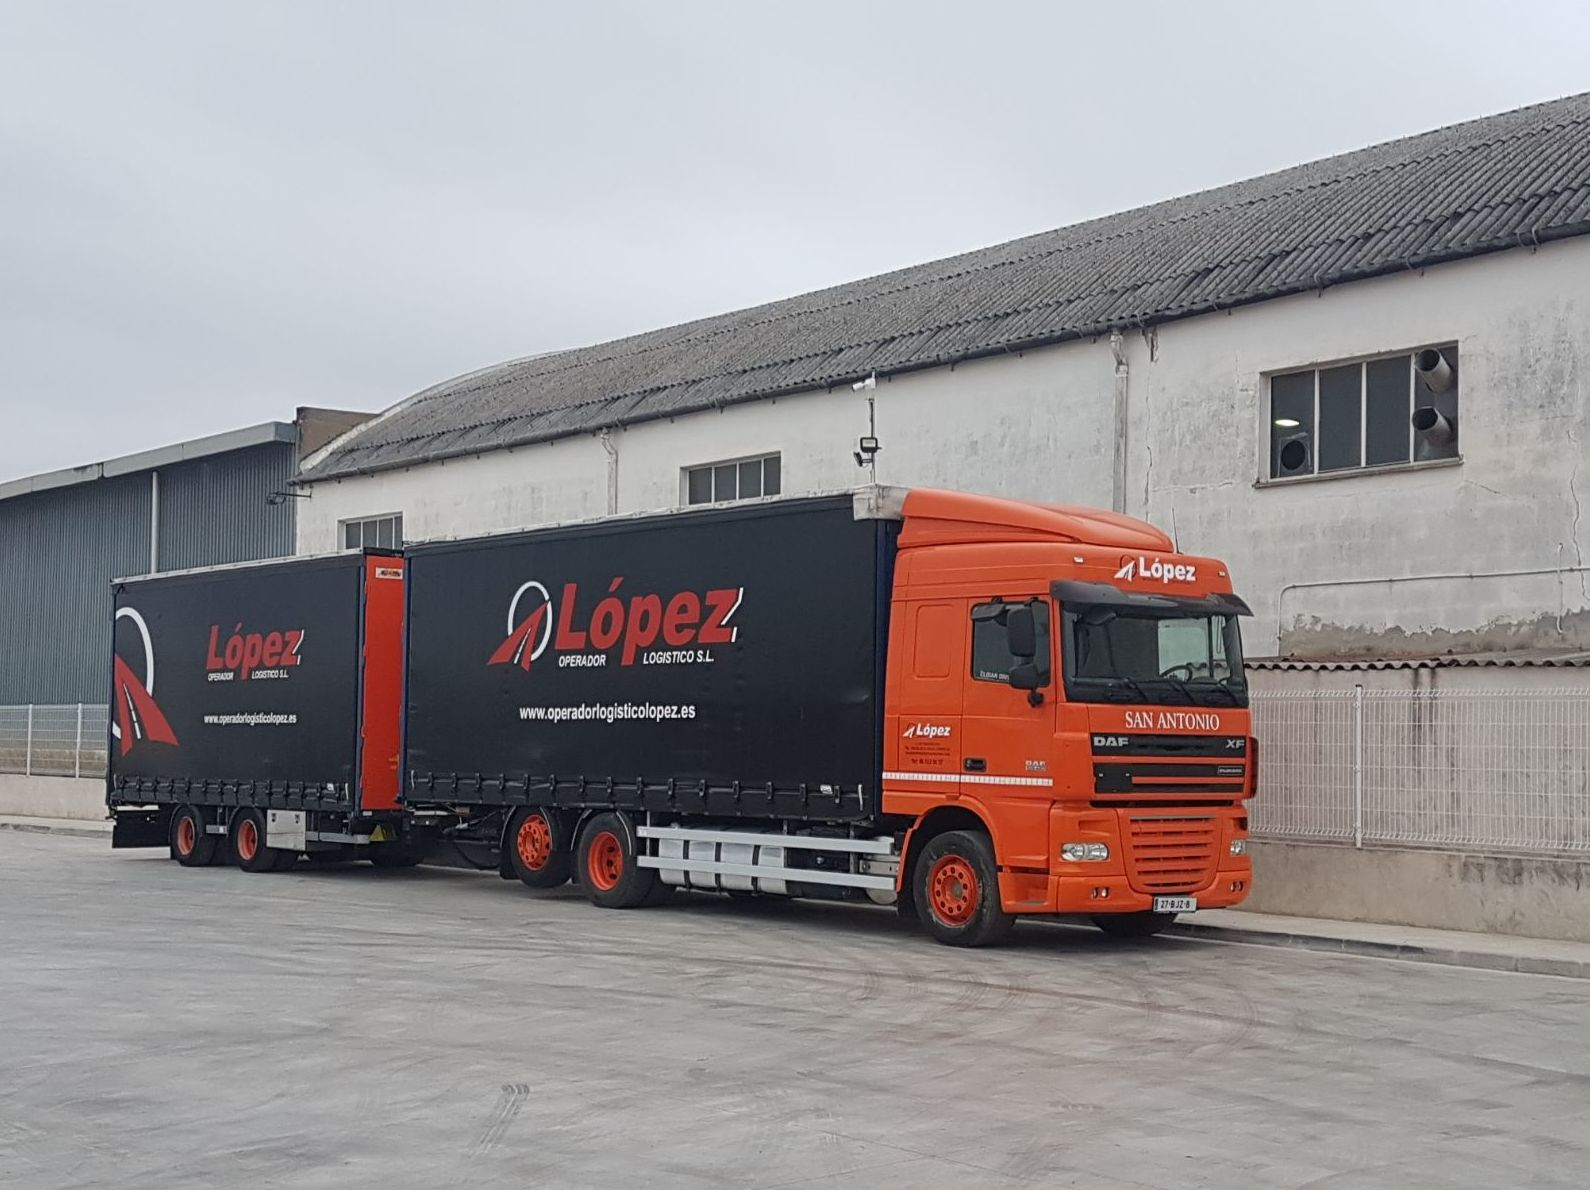 Foto 17 de Transportes de mercancía por grupaje o cargas completas en 46950 Xirivella | Transportes López